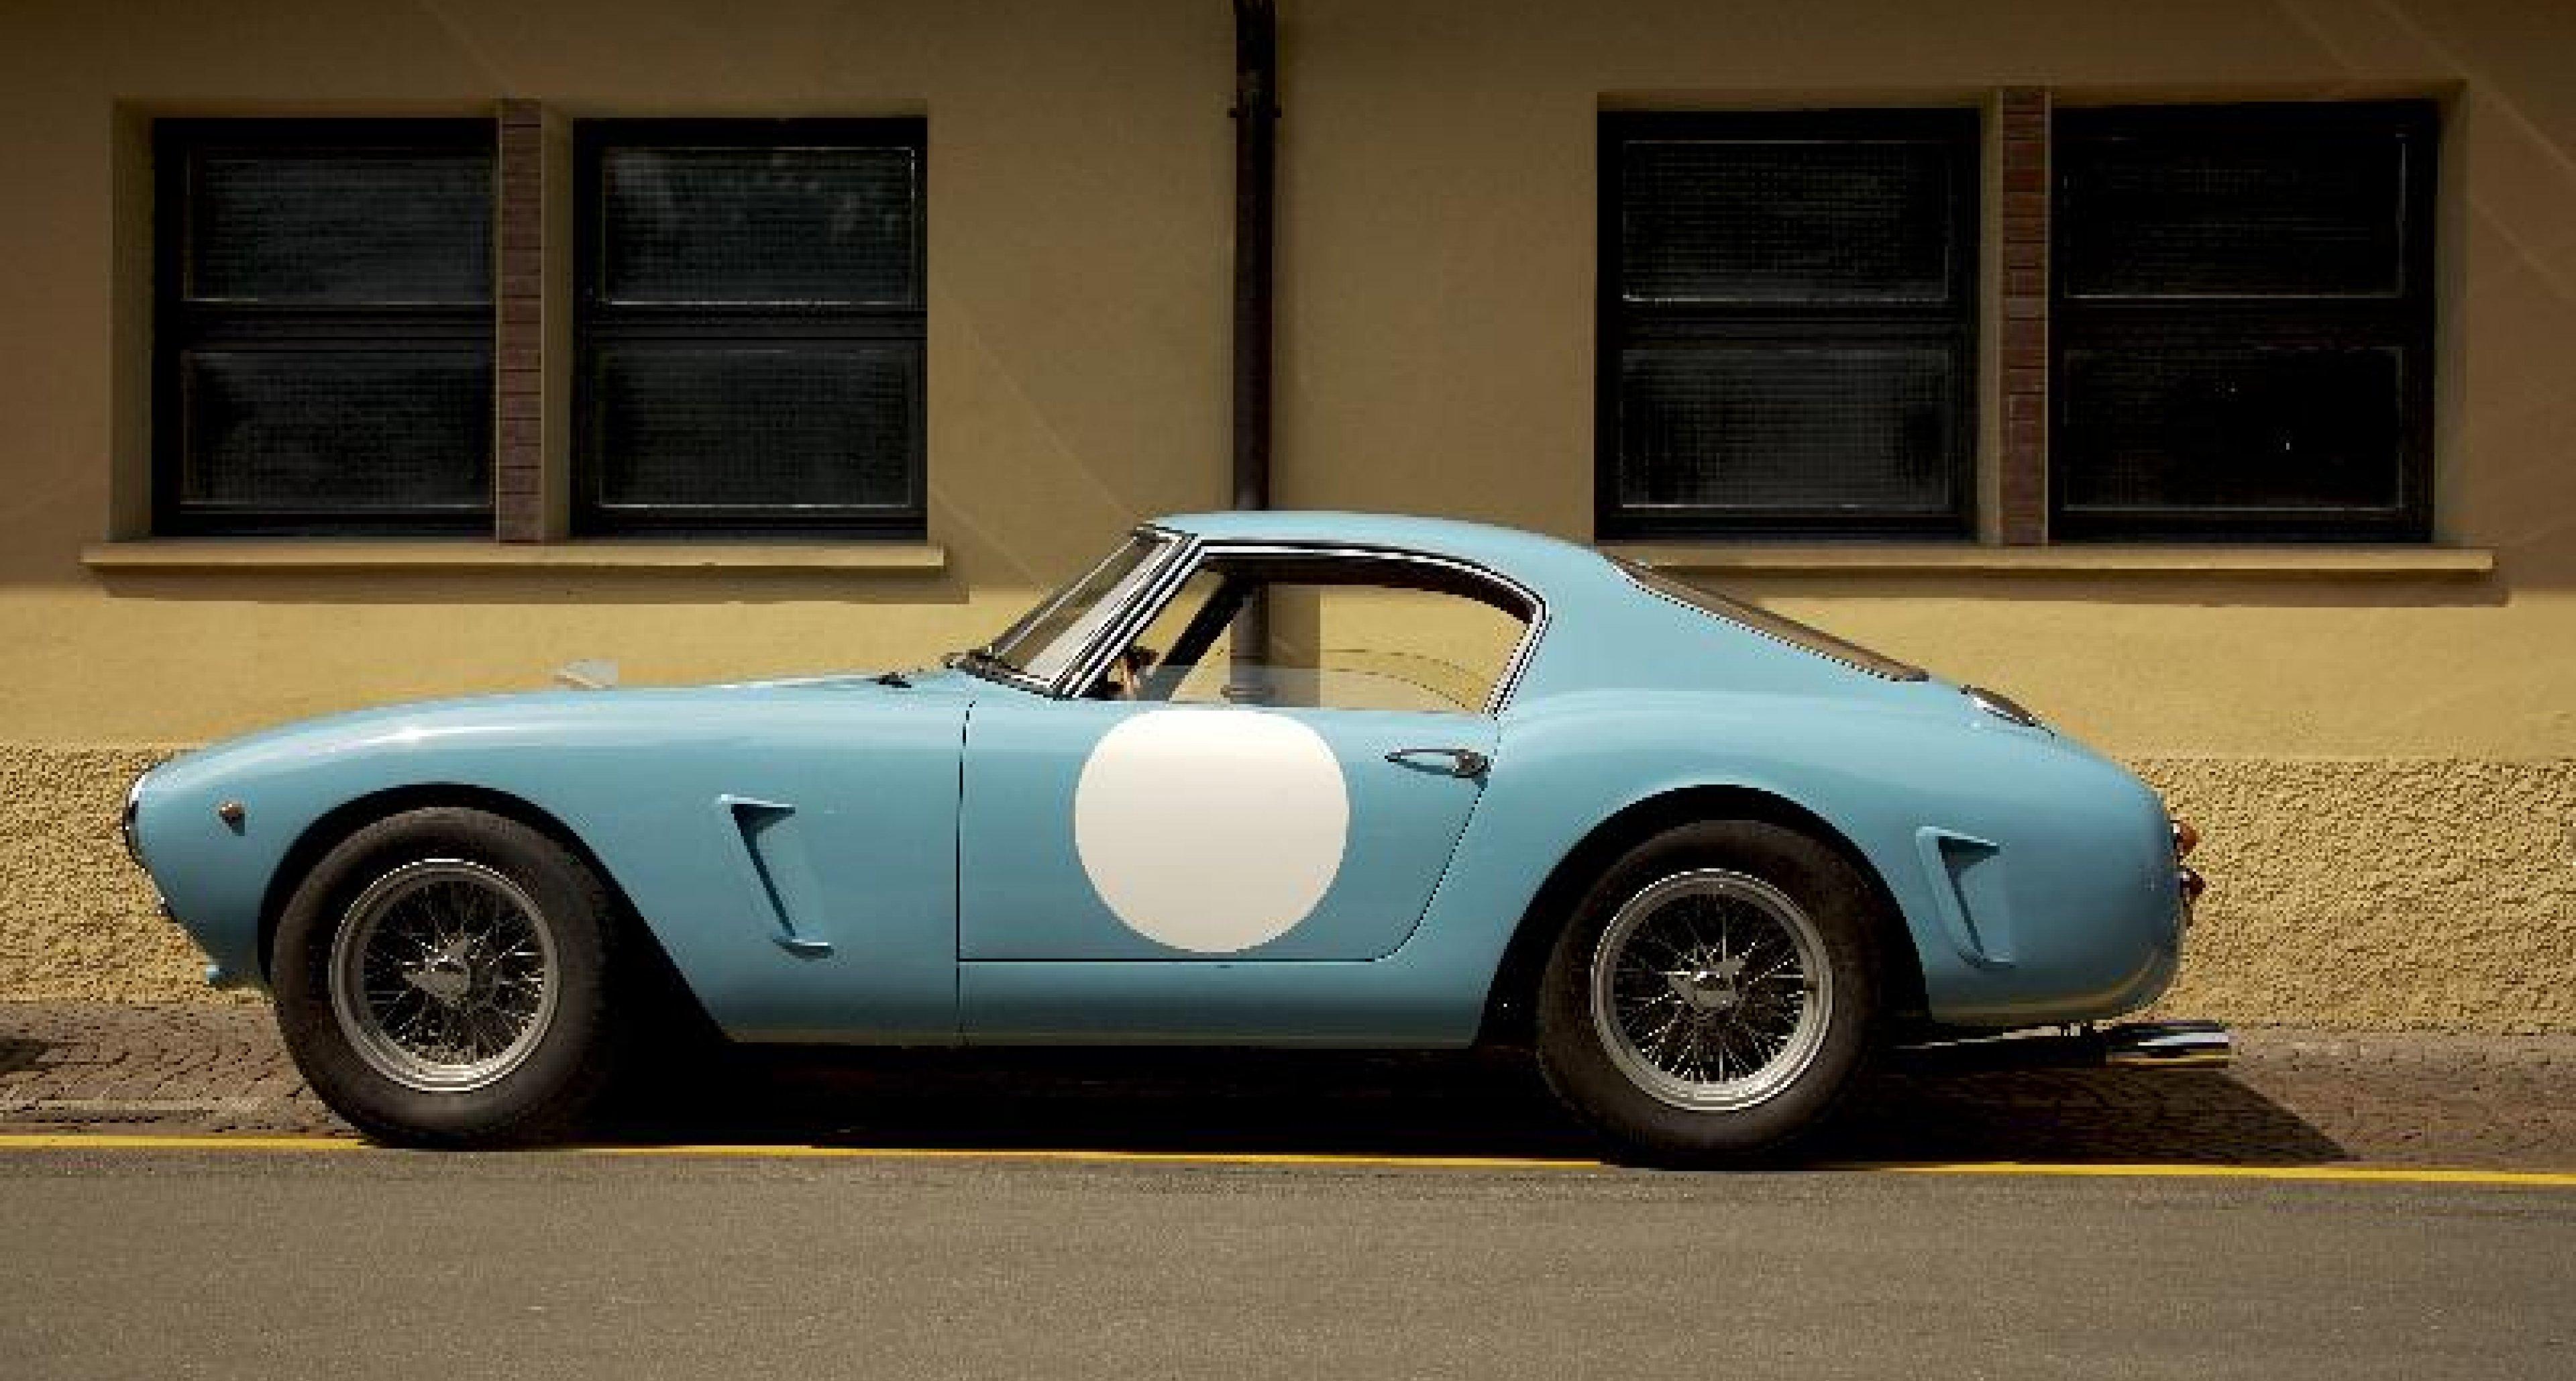 Ferrari 60 Concorso d'Eleganza – A Truly Memorable Weekend